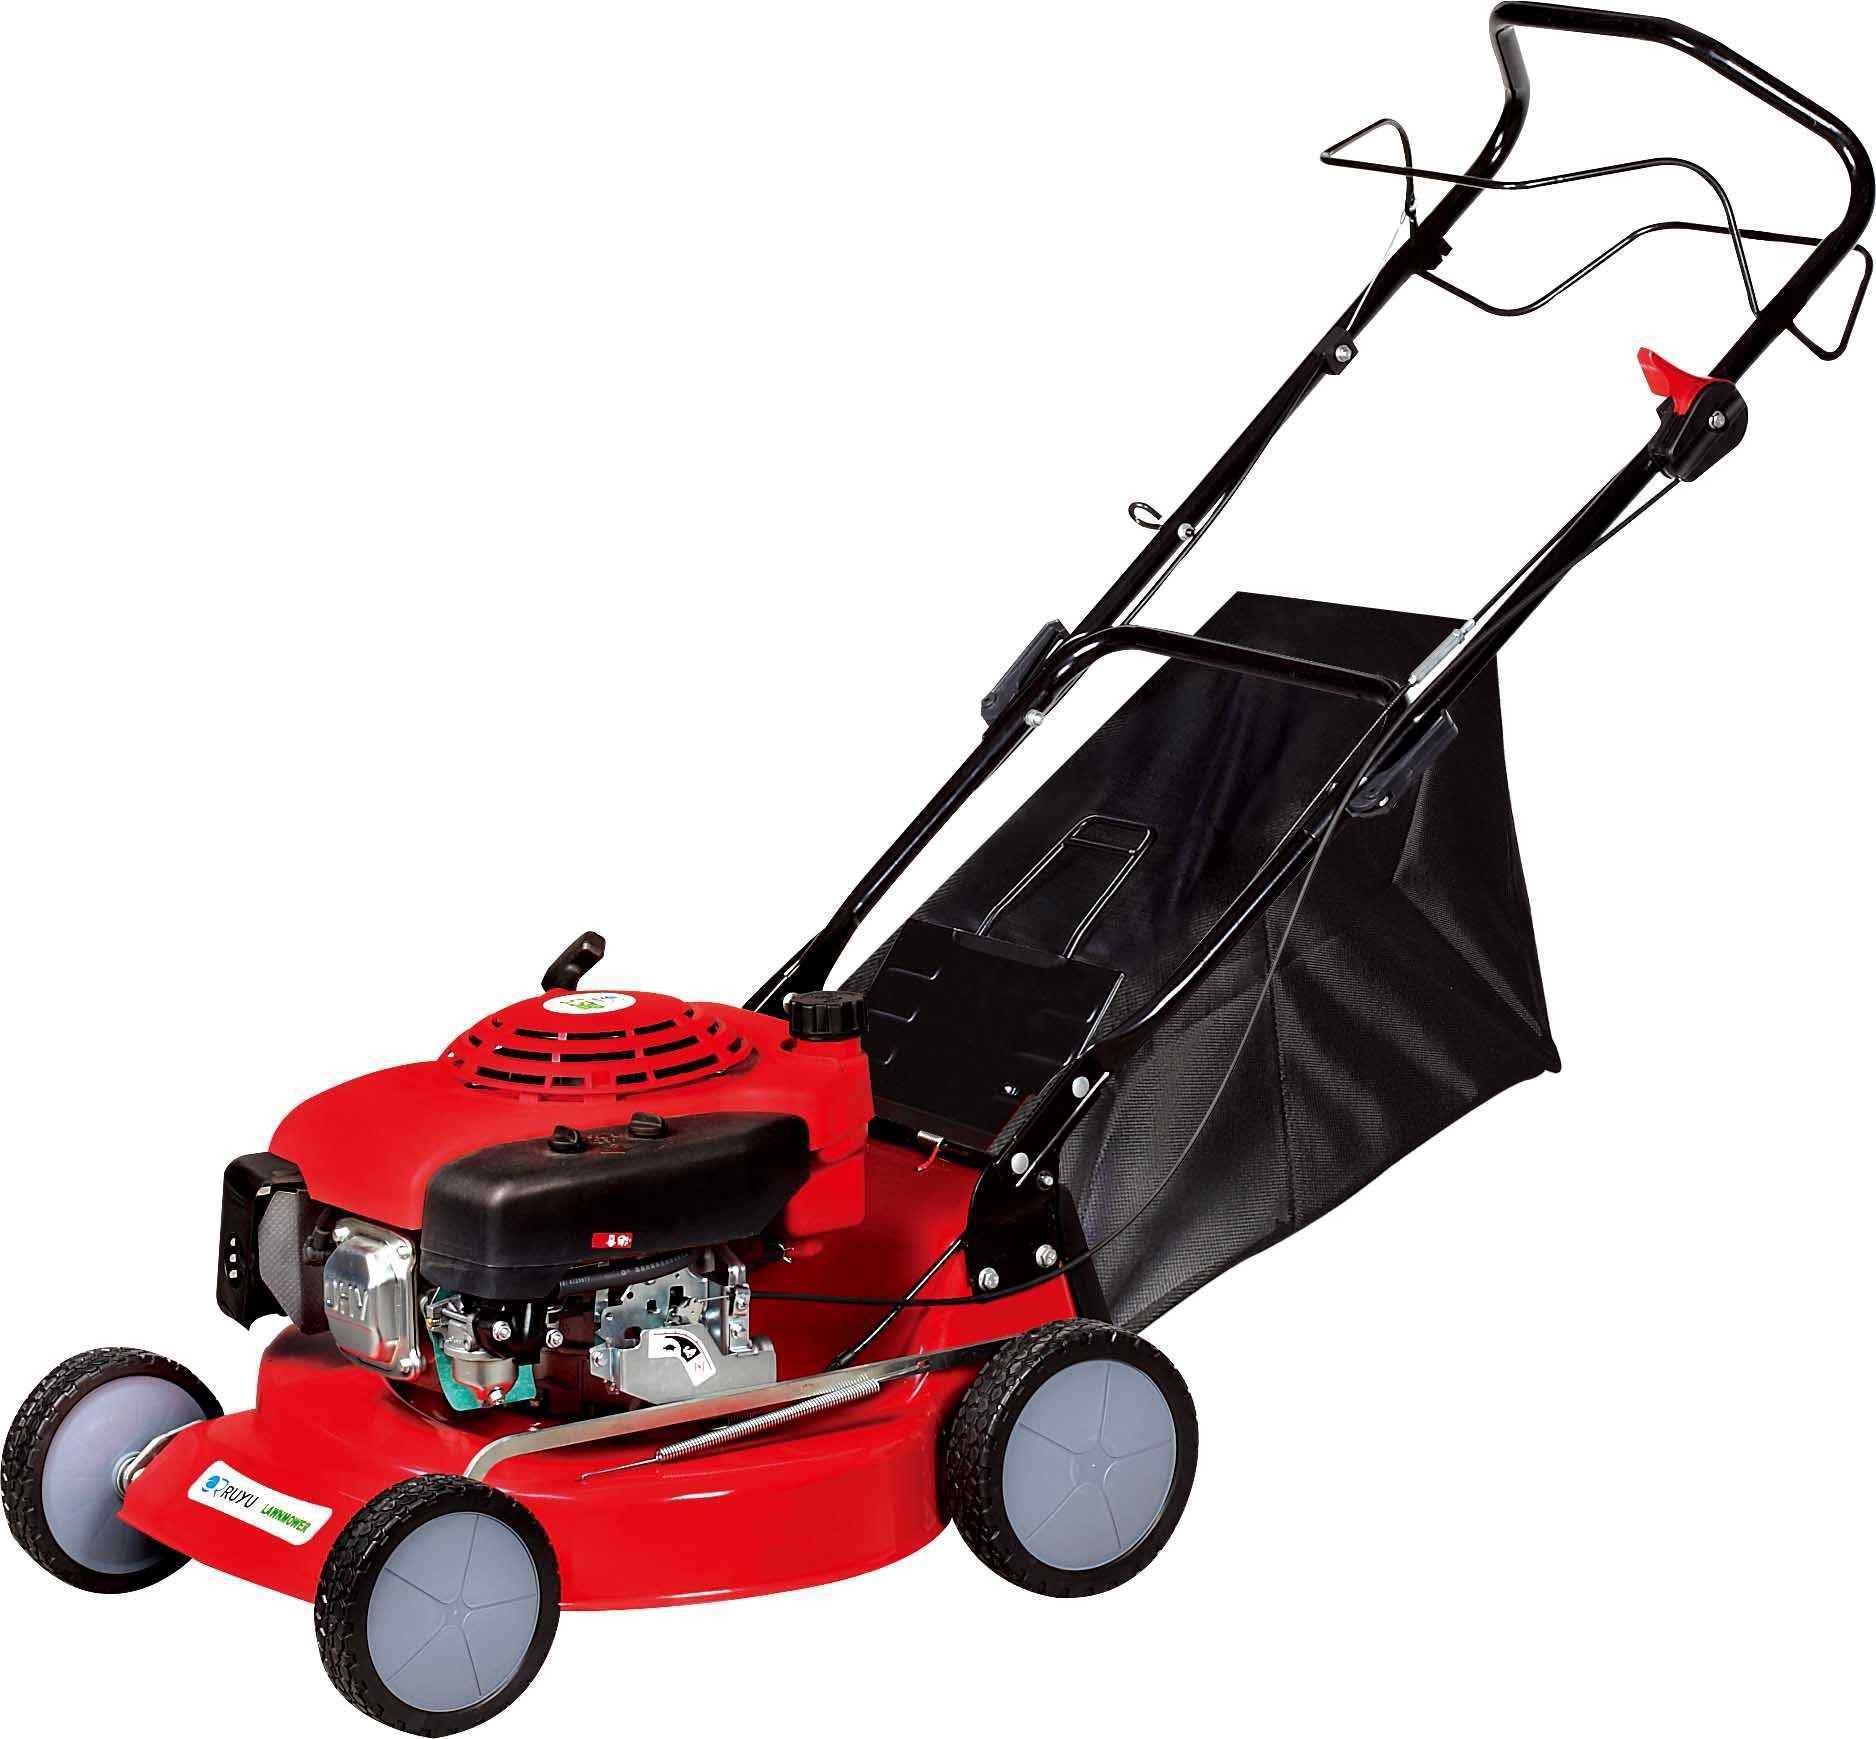 Riding lawn mower won t start - Riding Lawn Mower Won T Start When Hotels Were Built In Ovens